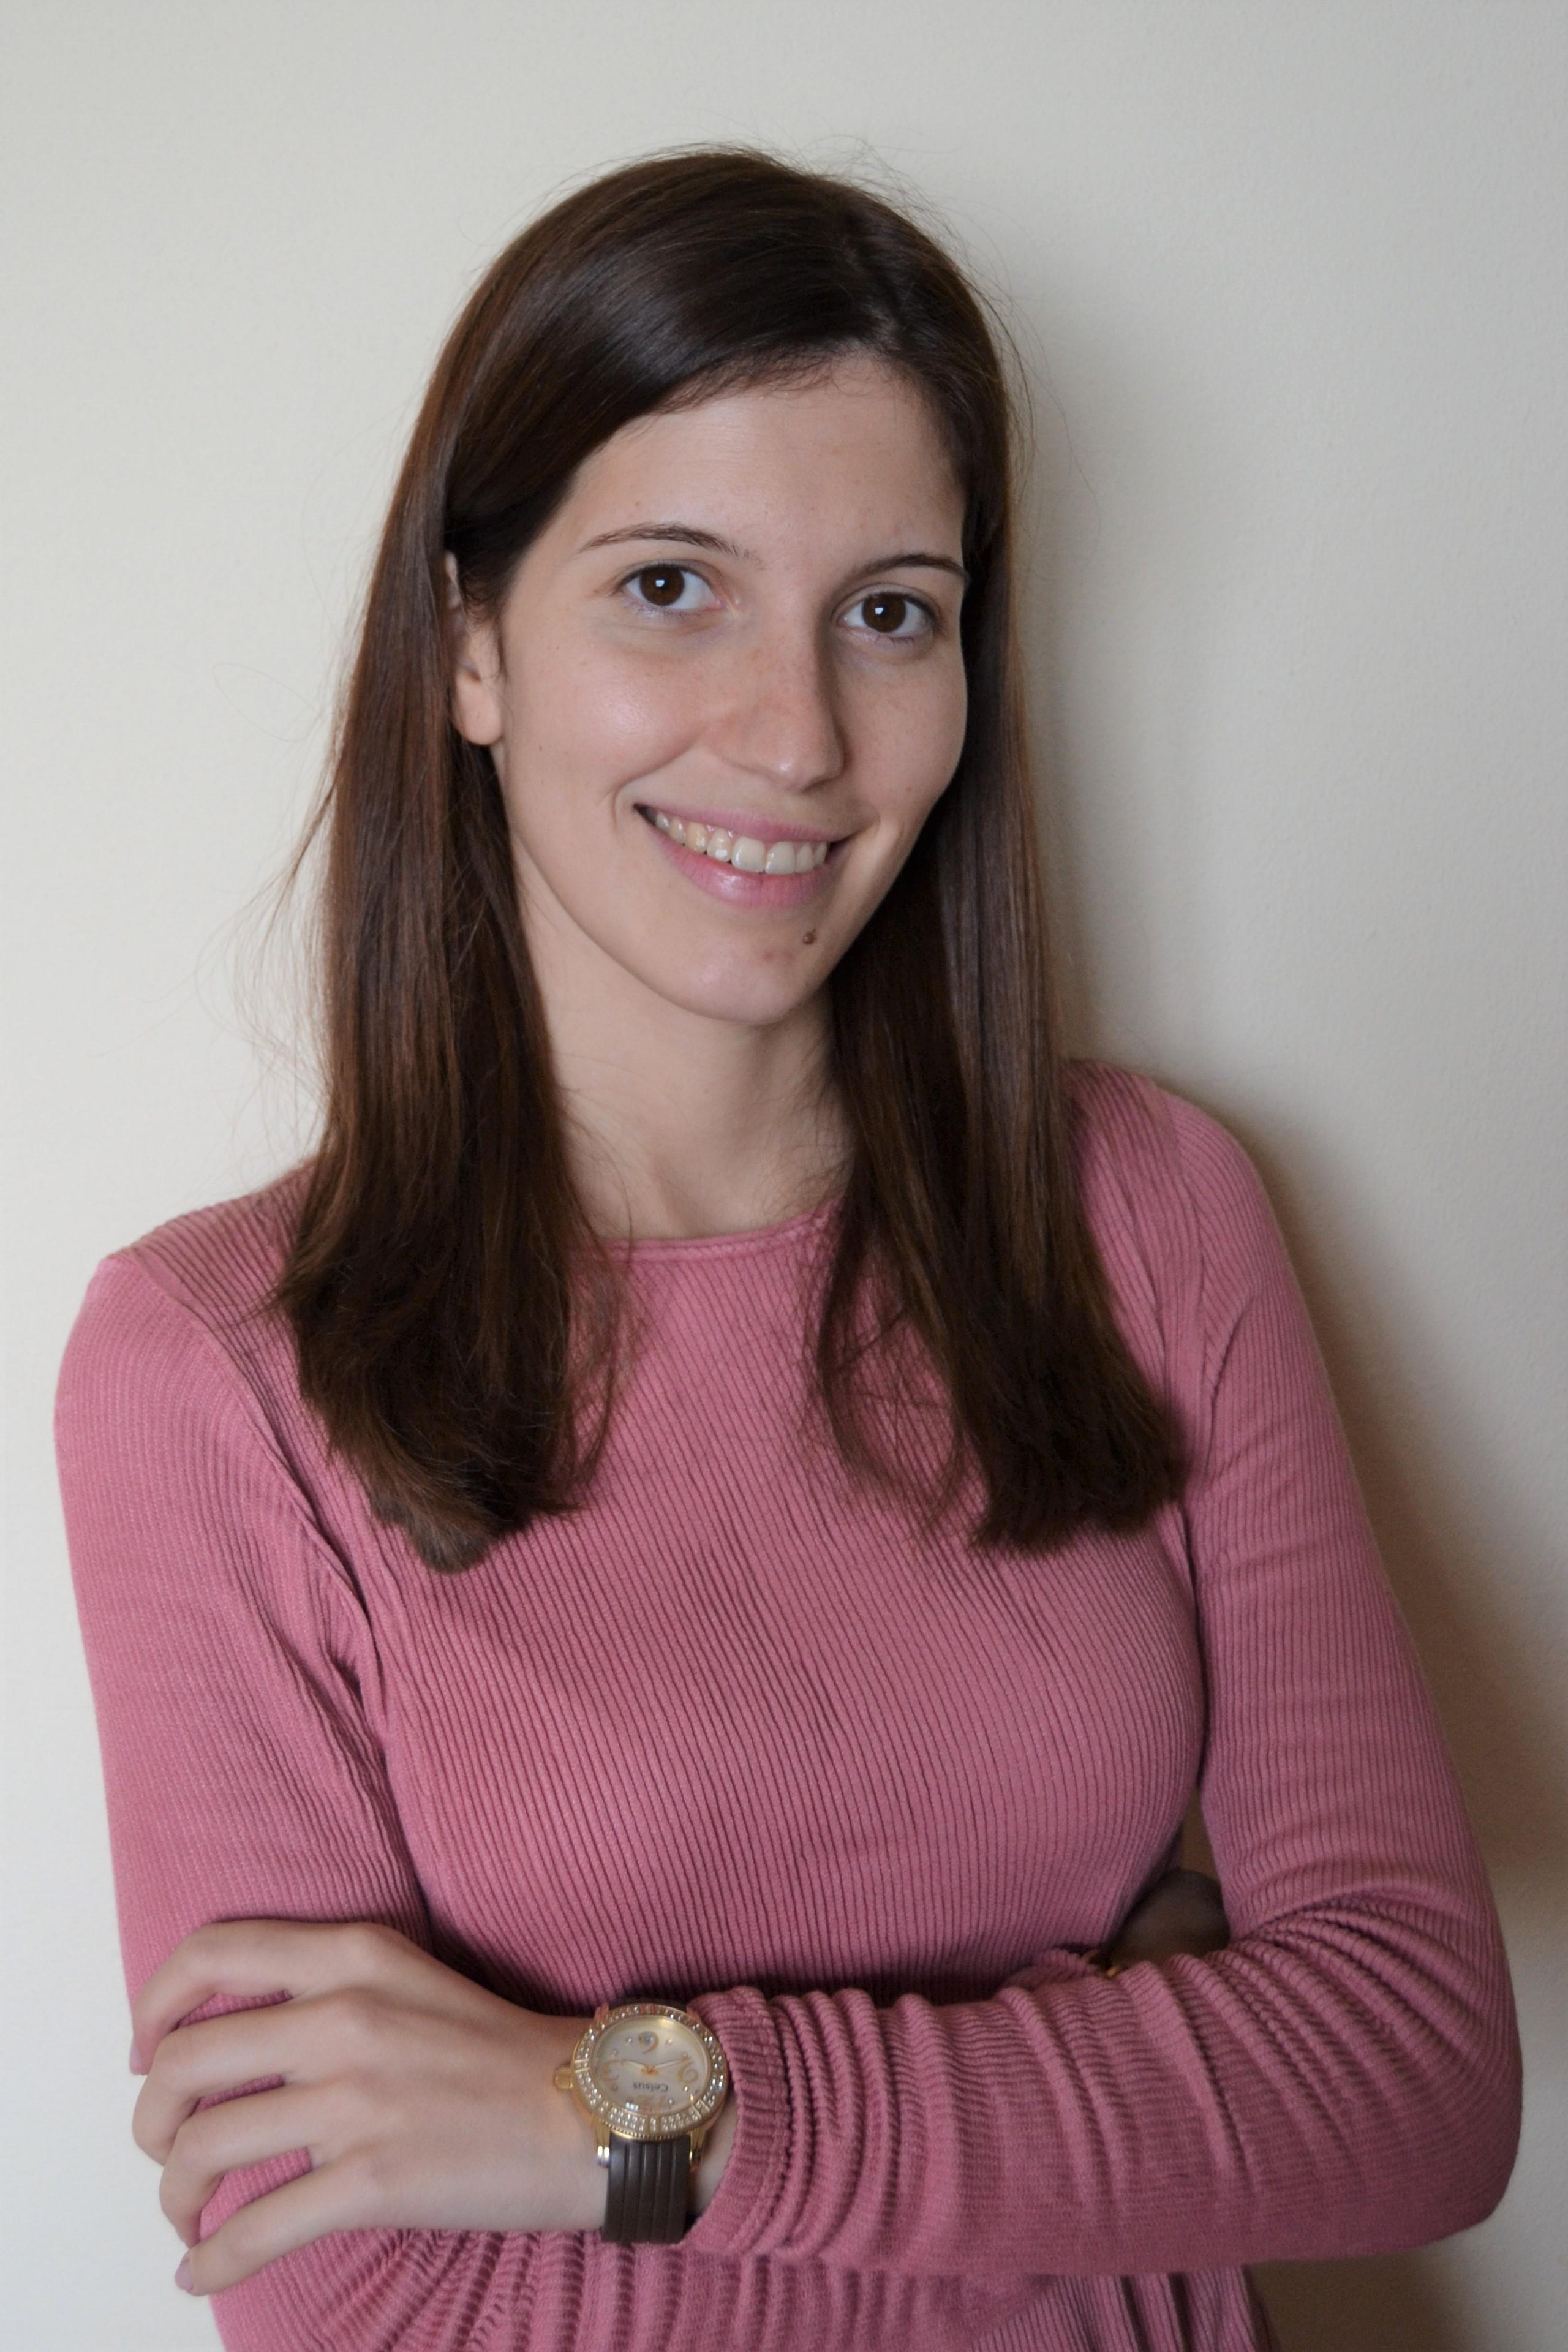 Jessica Fernandes